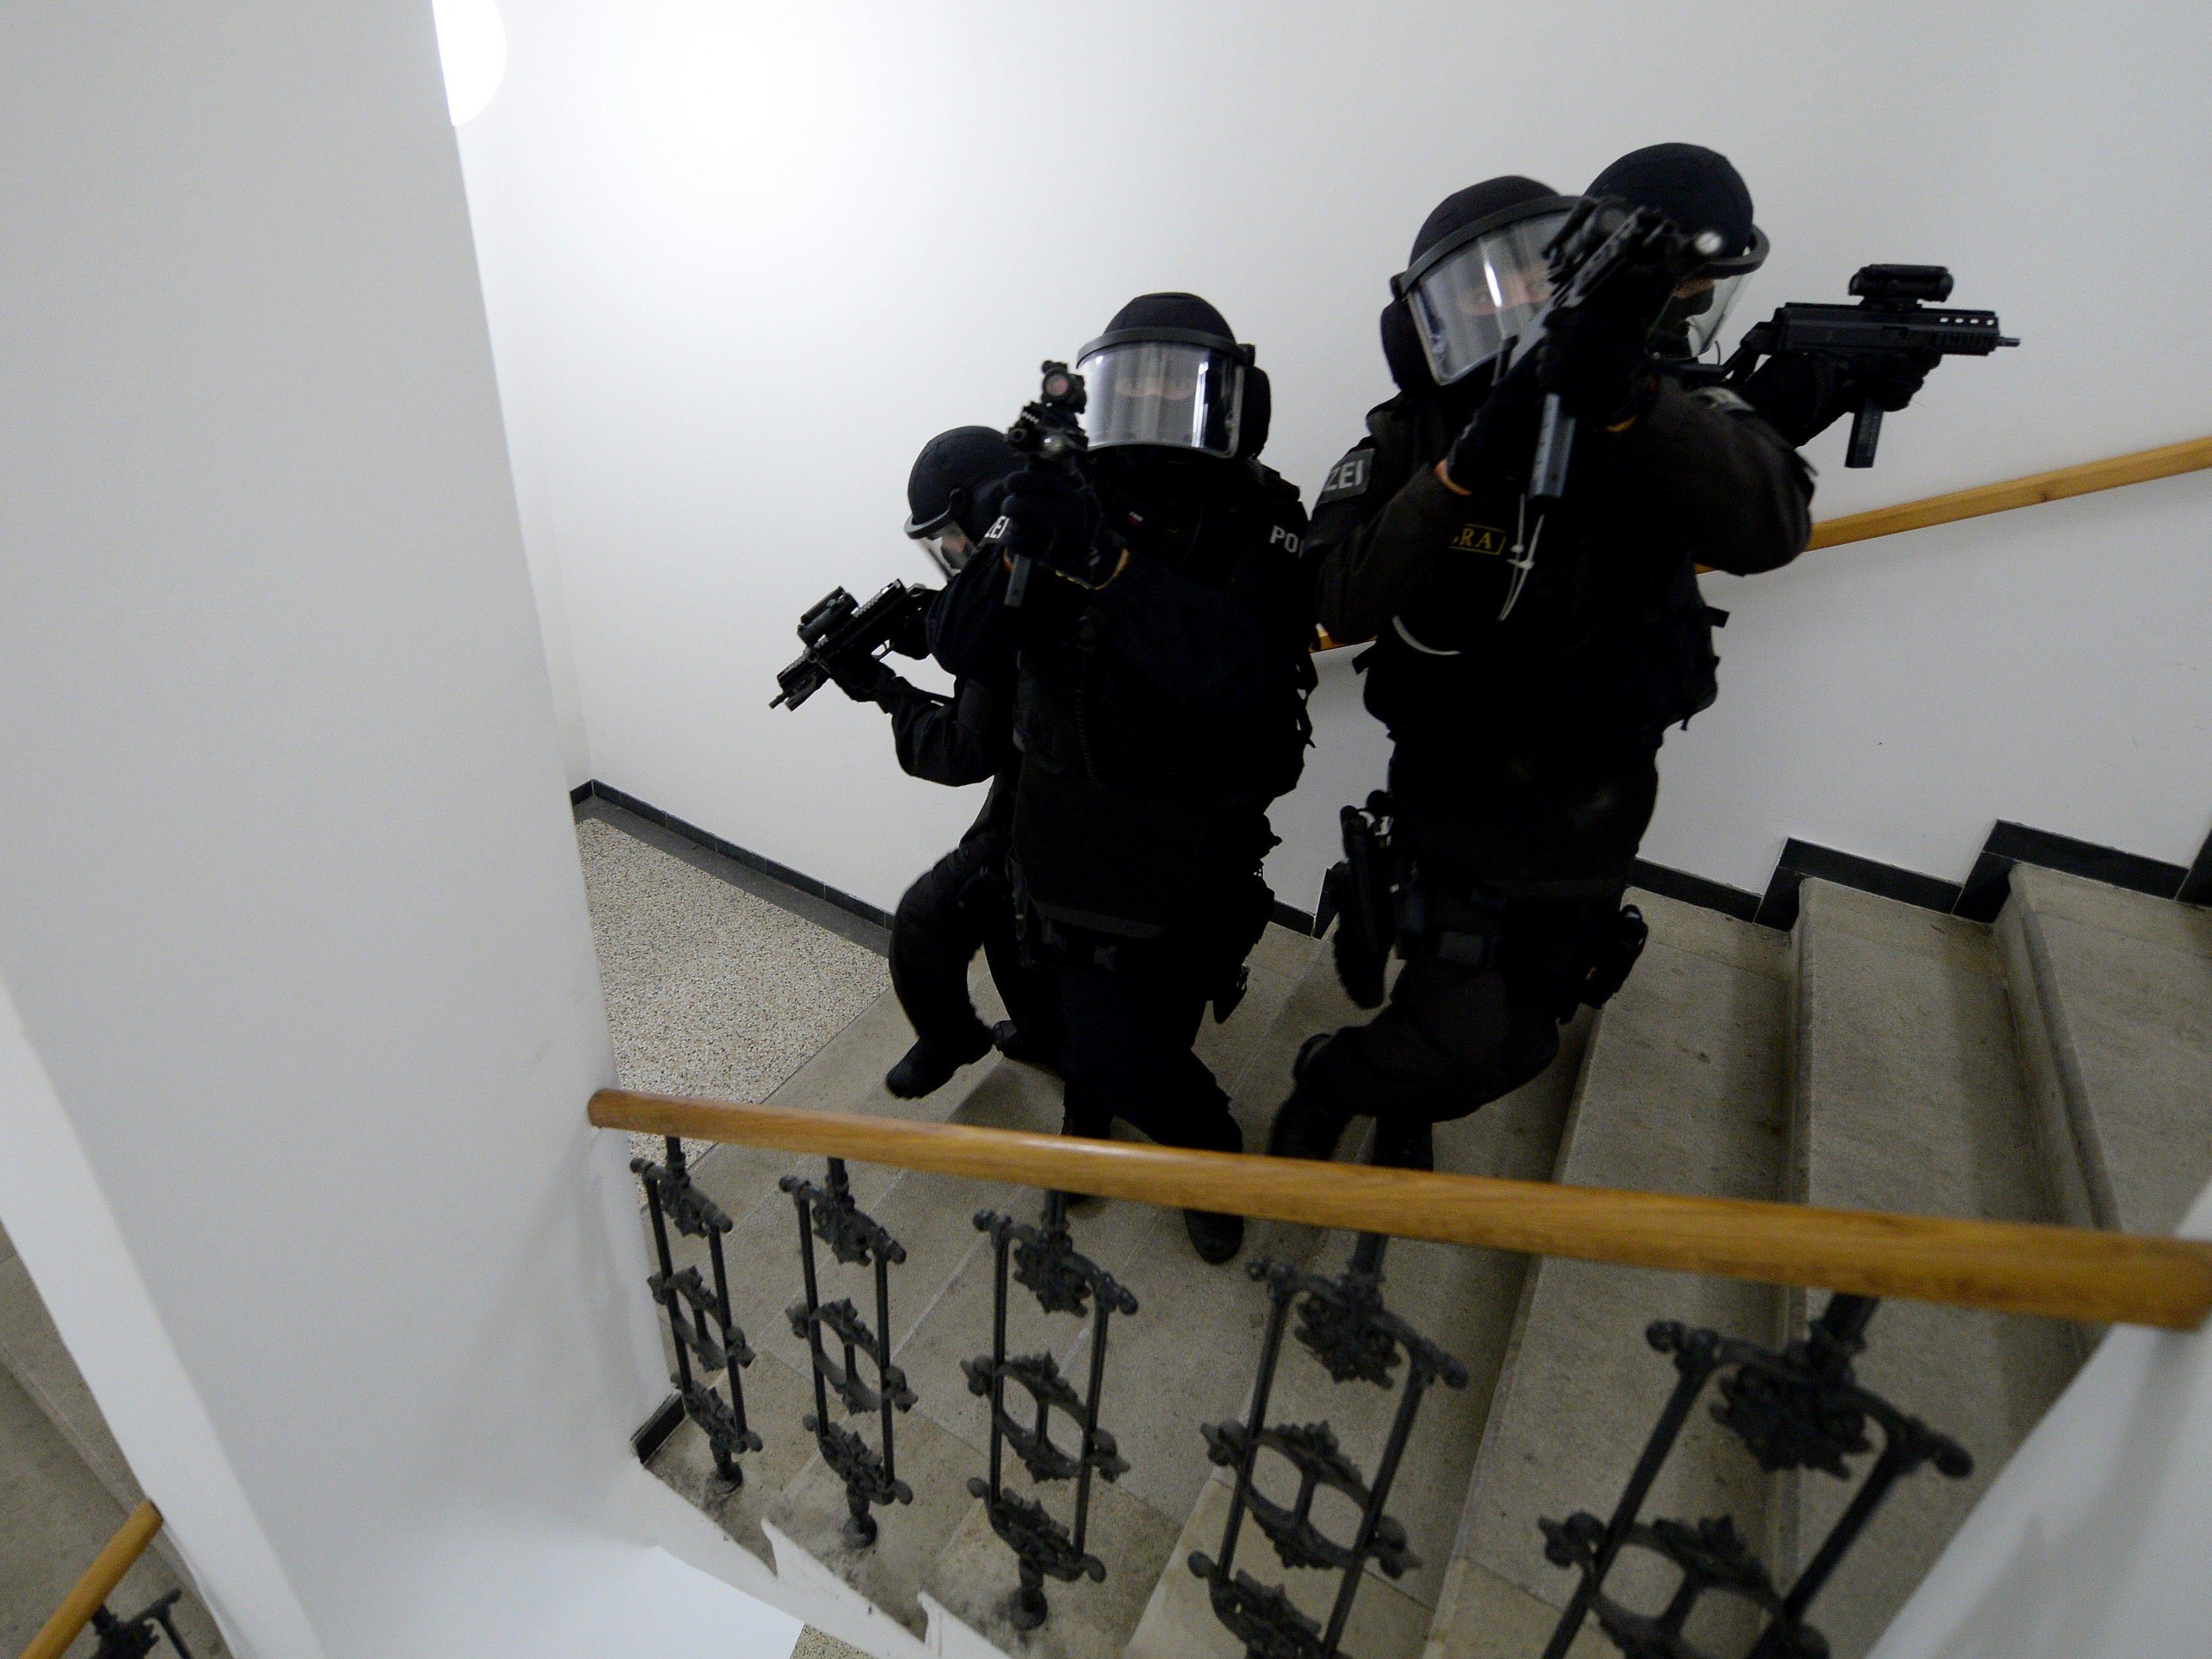 Fünf Terrorverdächtige in St. Pölten verhaftet.